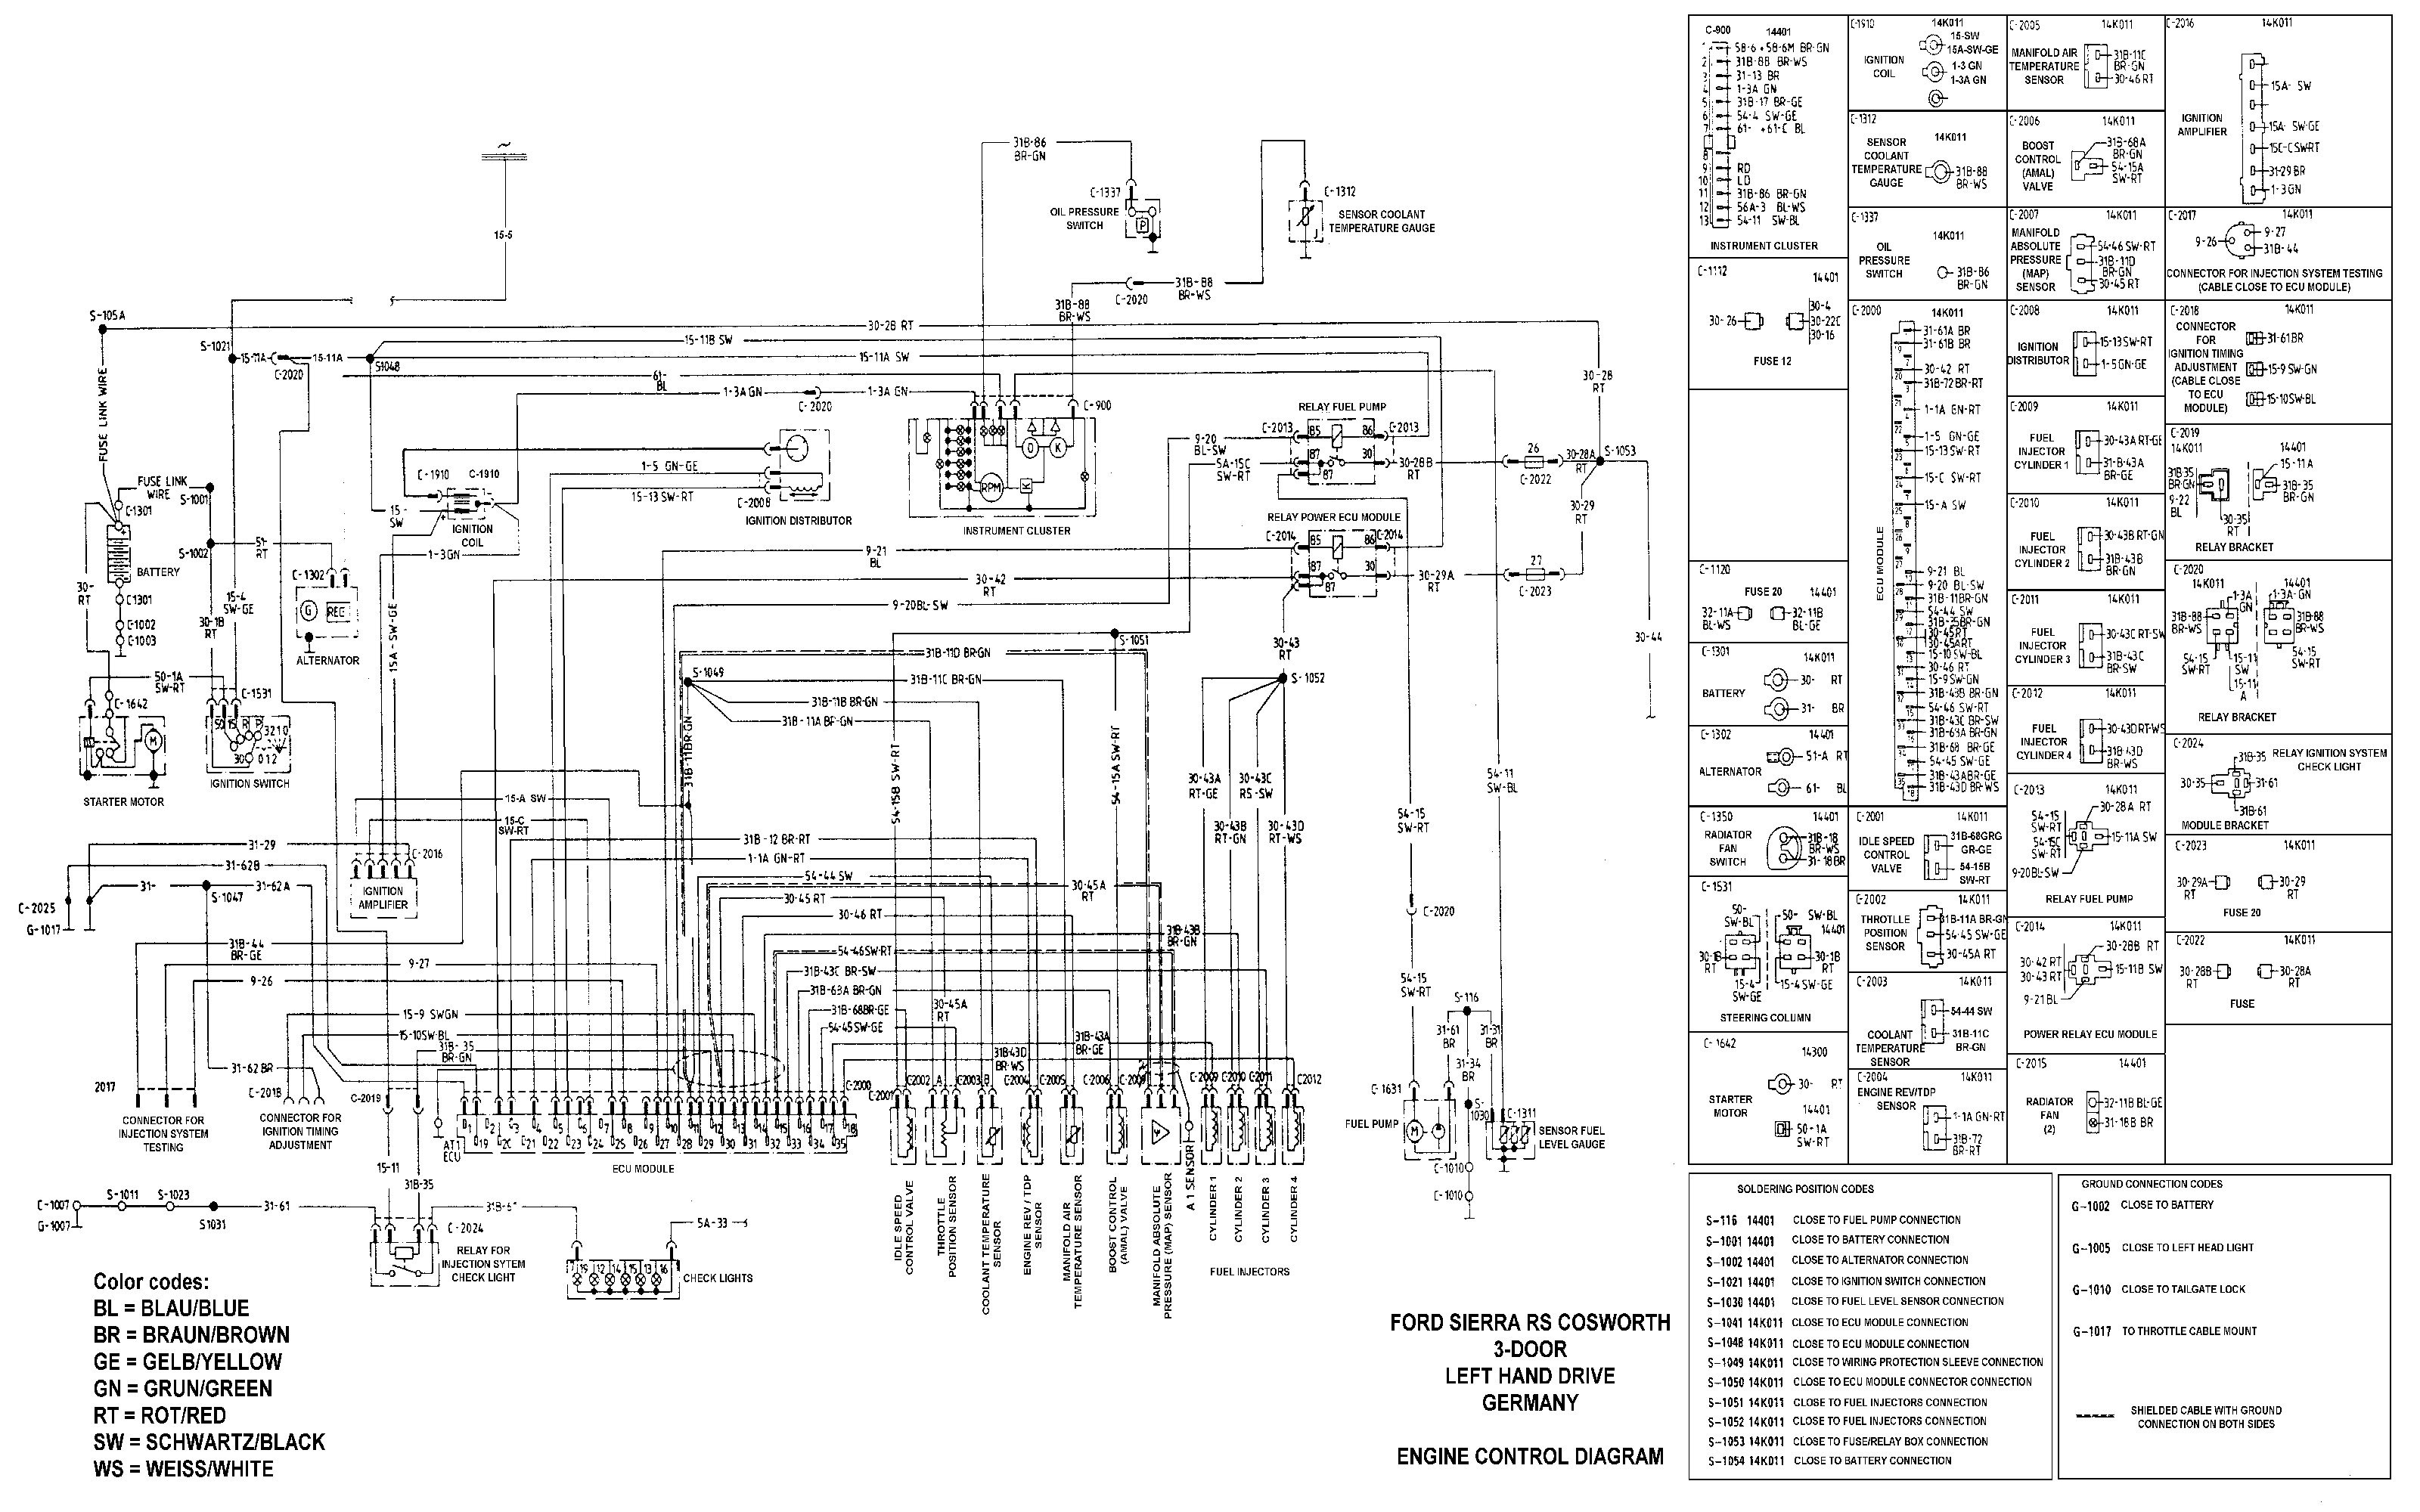 Ford Focus Mk2 Wiring Diagram Diagram Base Website Wiring Diagram -  HEARTCIRCULATIONDIAGRAM.ANTICOTEVERE.ITDiagram Base Website Full Edition